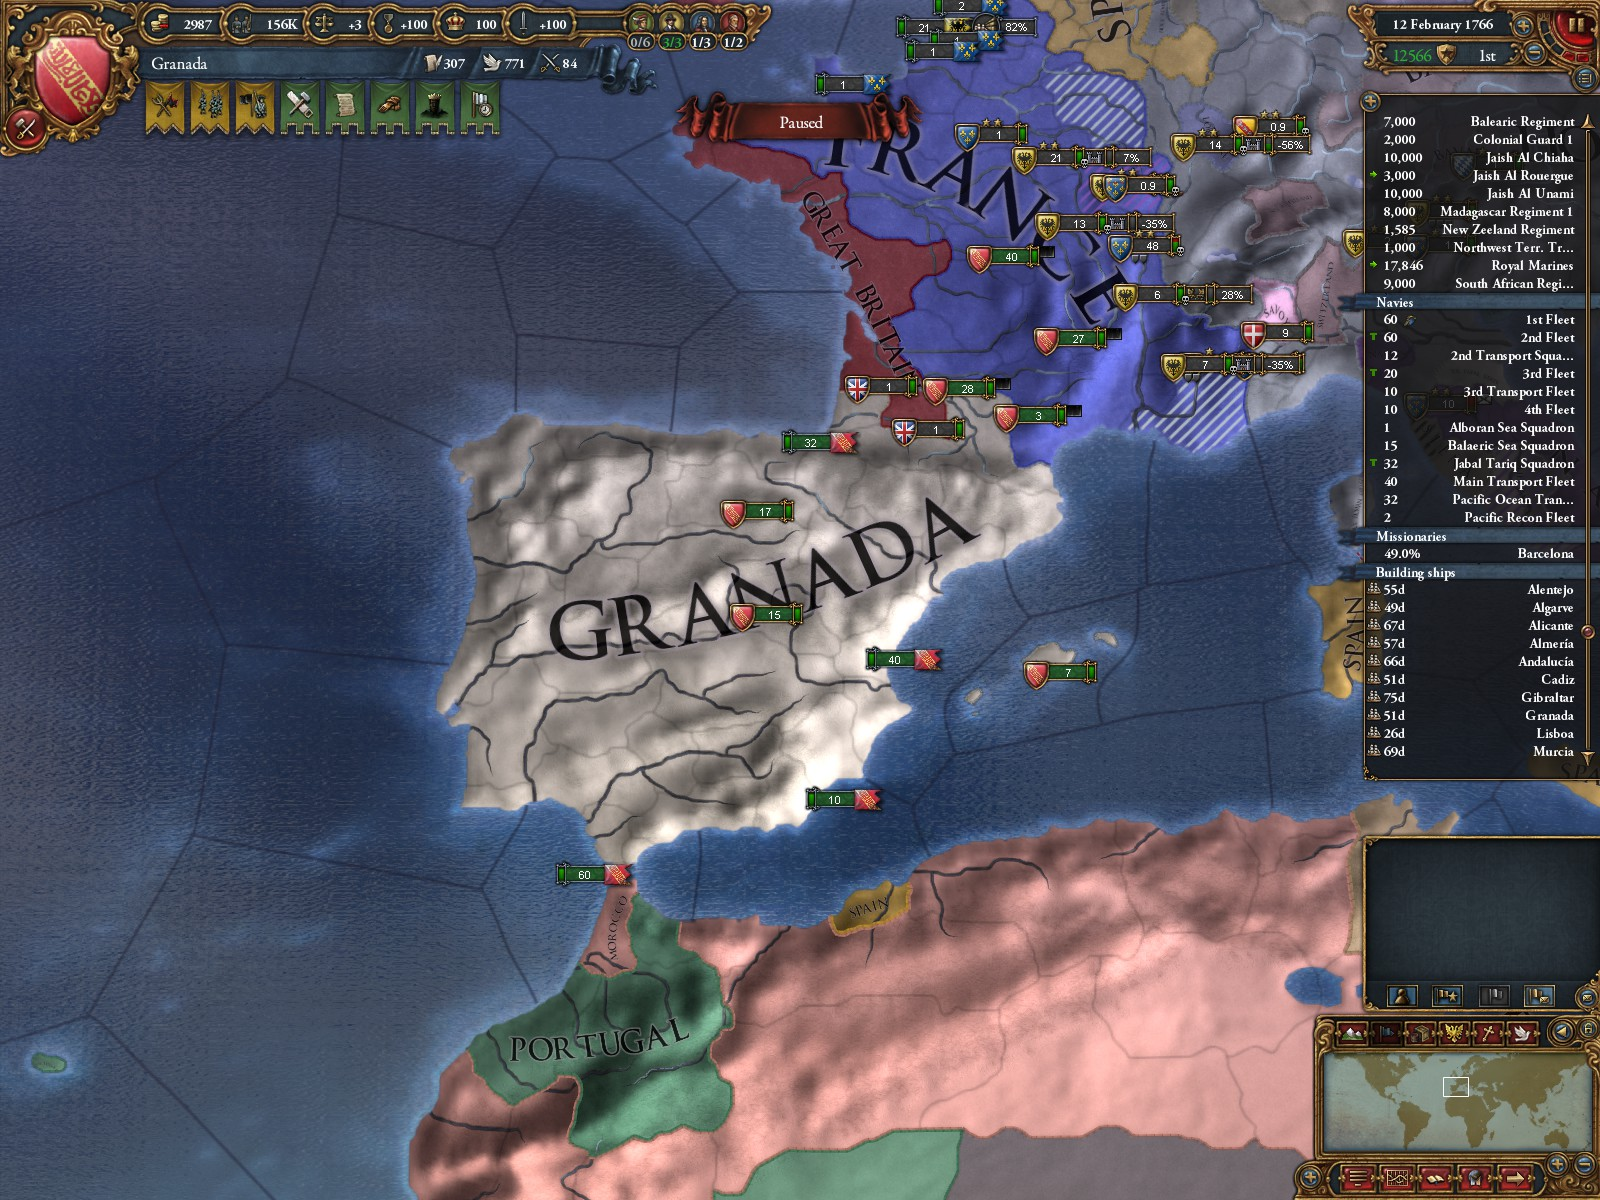 Comunidad Steam :: Guía :: Granada Guide: The Re-Reconquista